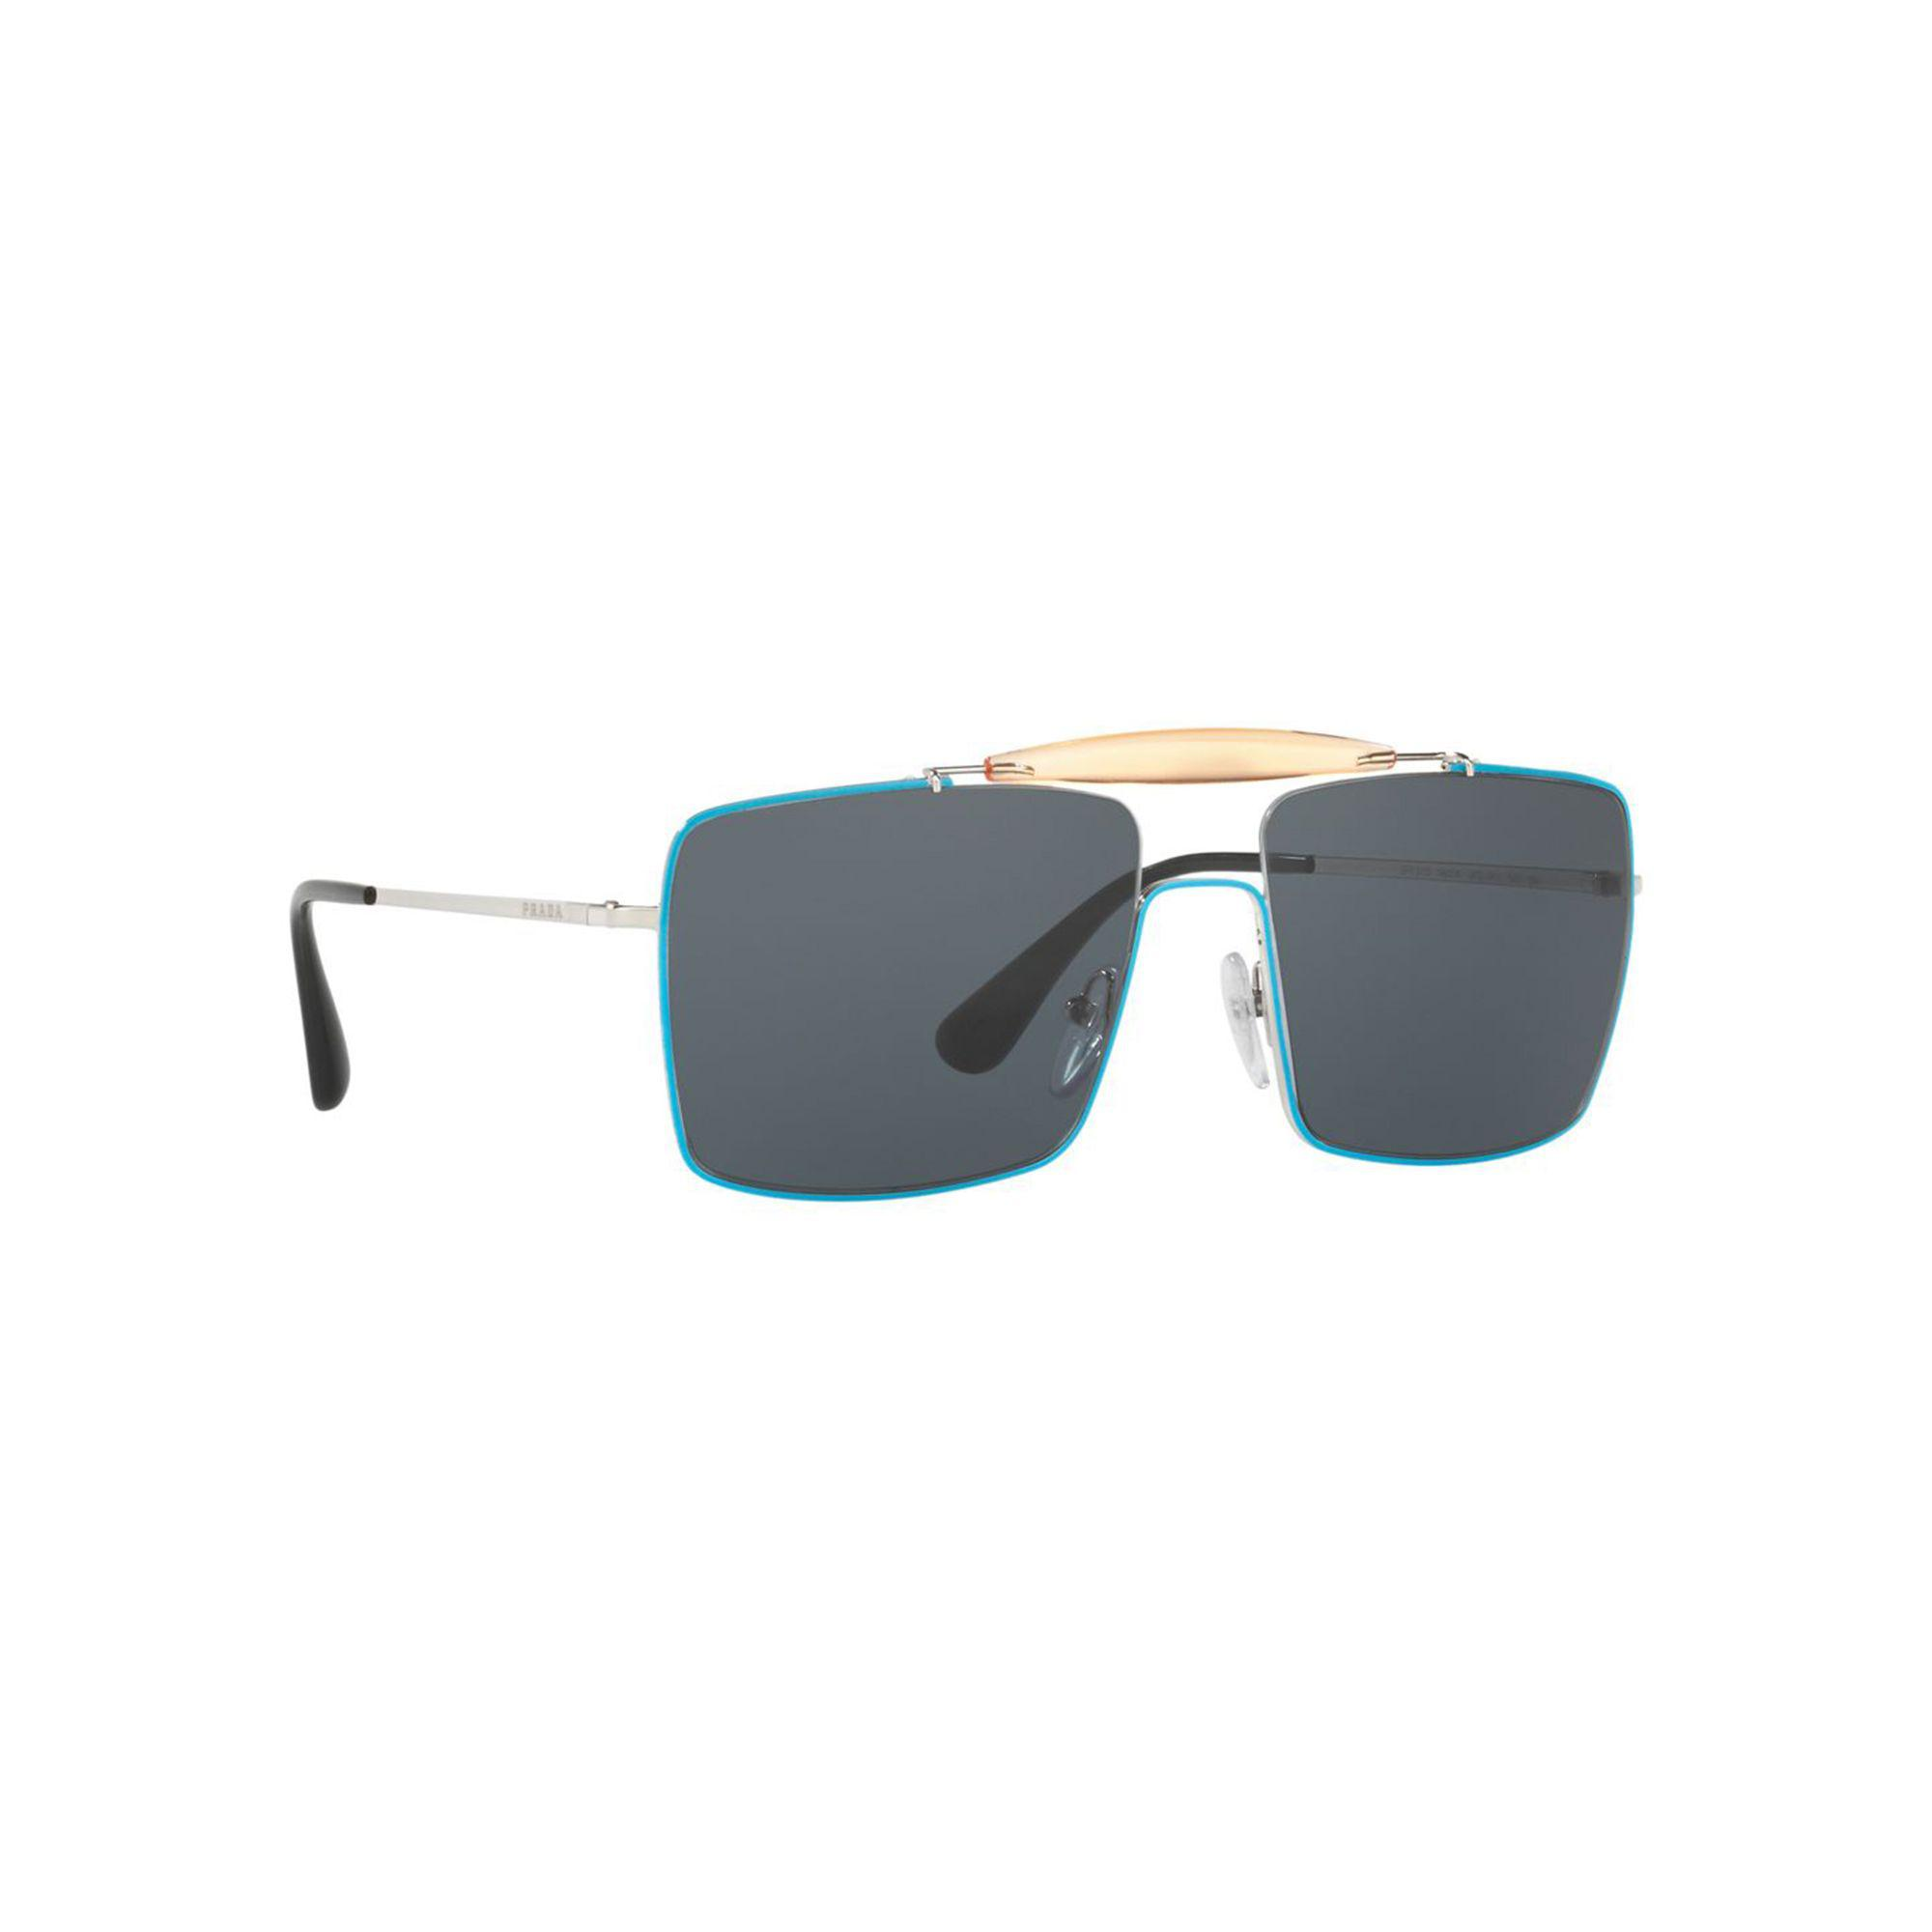 8a345b4baf1 Blue In Square Silver Sunglasses Lyst Prada Pr57ss Men For YqxqP4